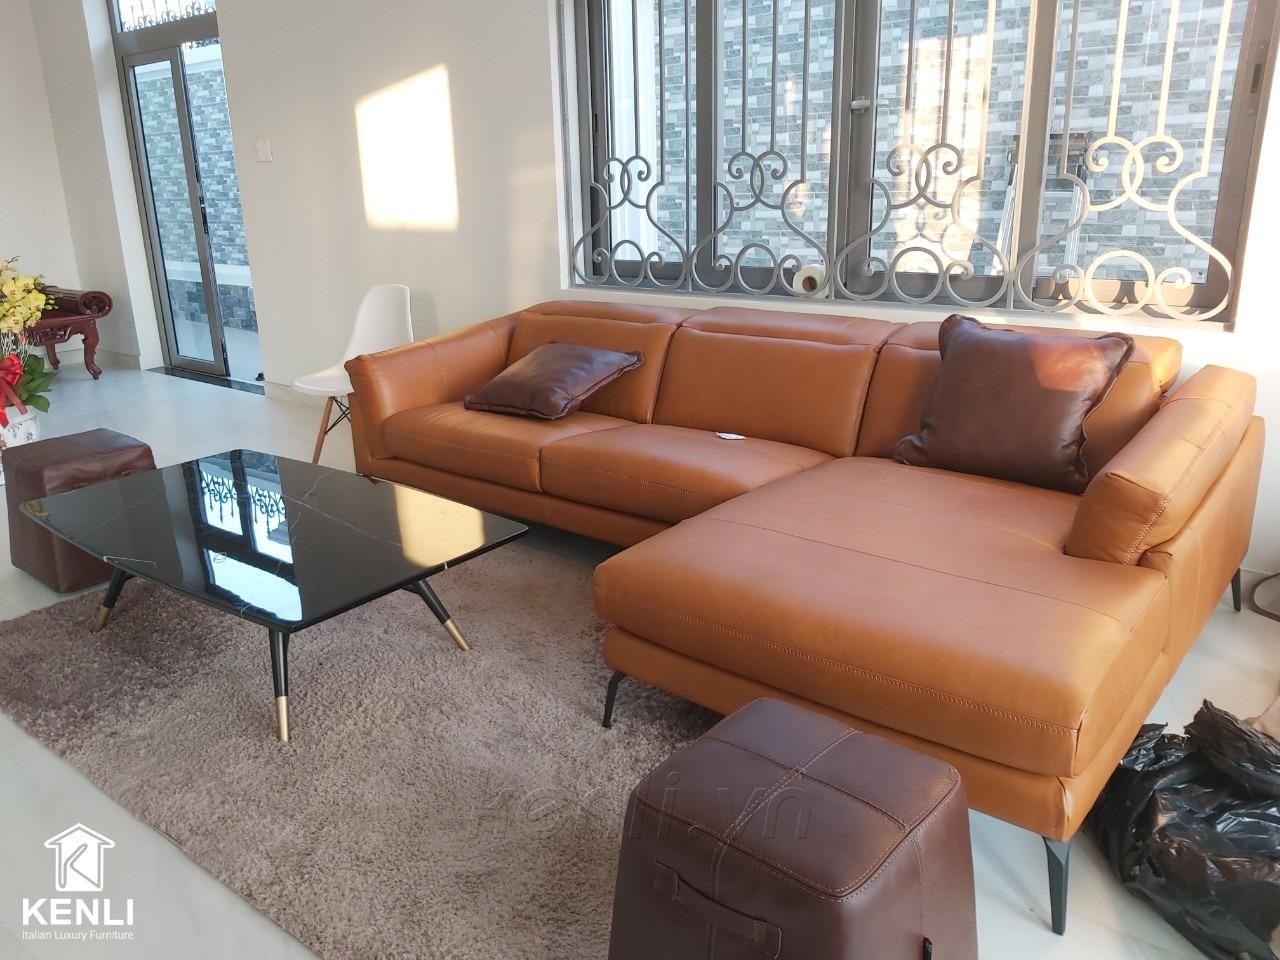 Sofa da thật F021 tại nhà khách hàng